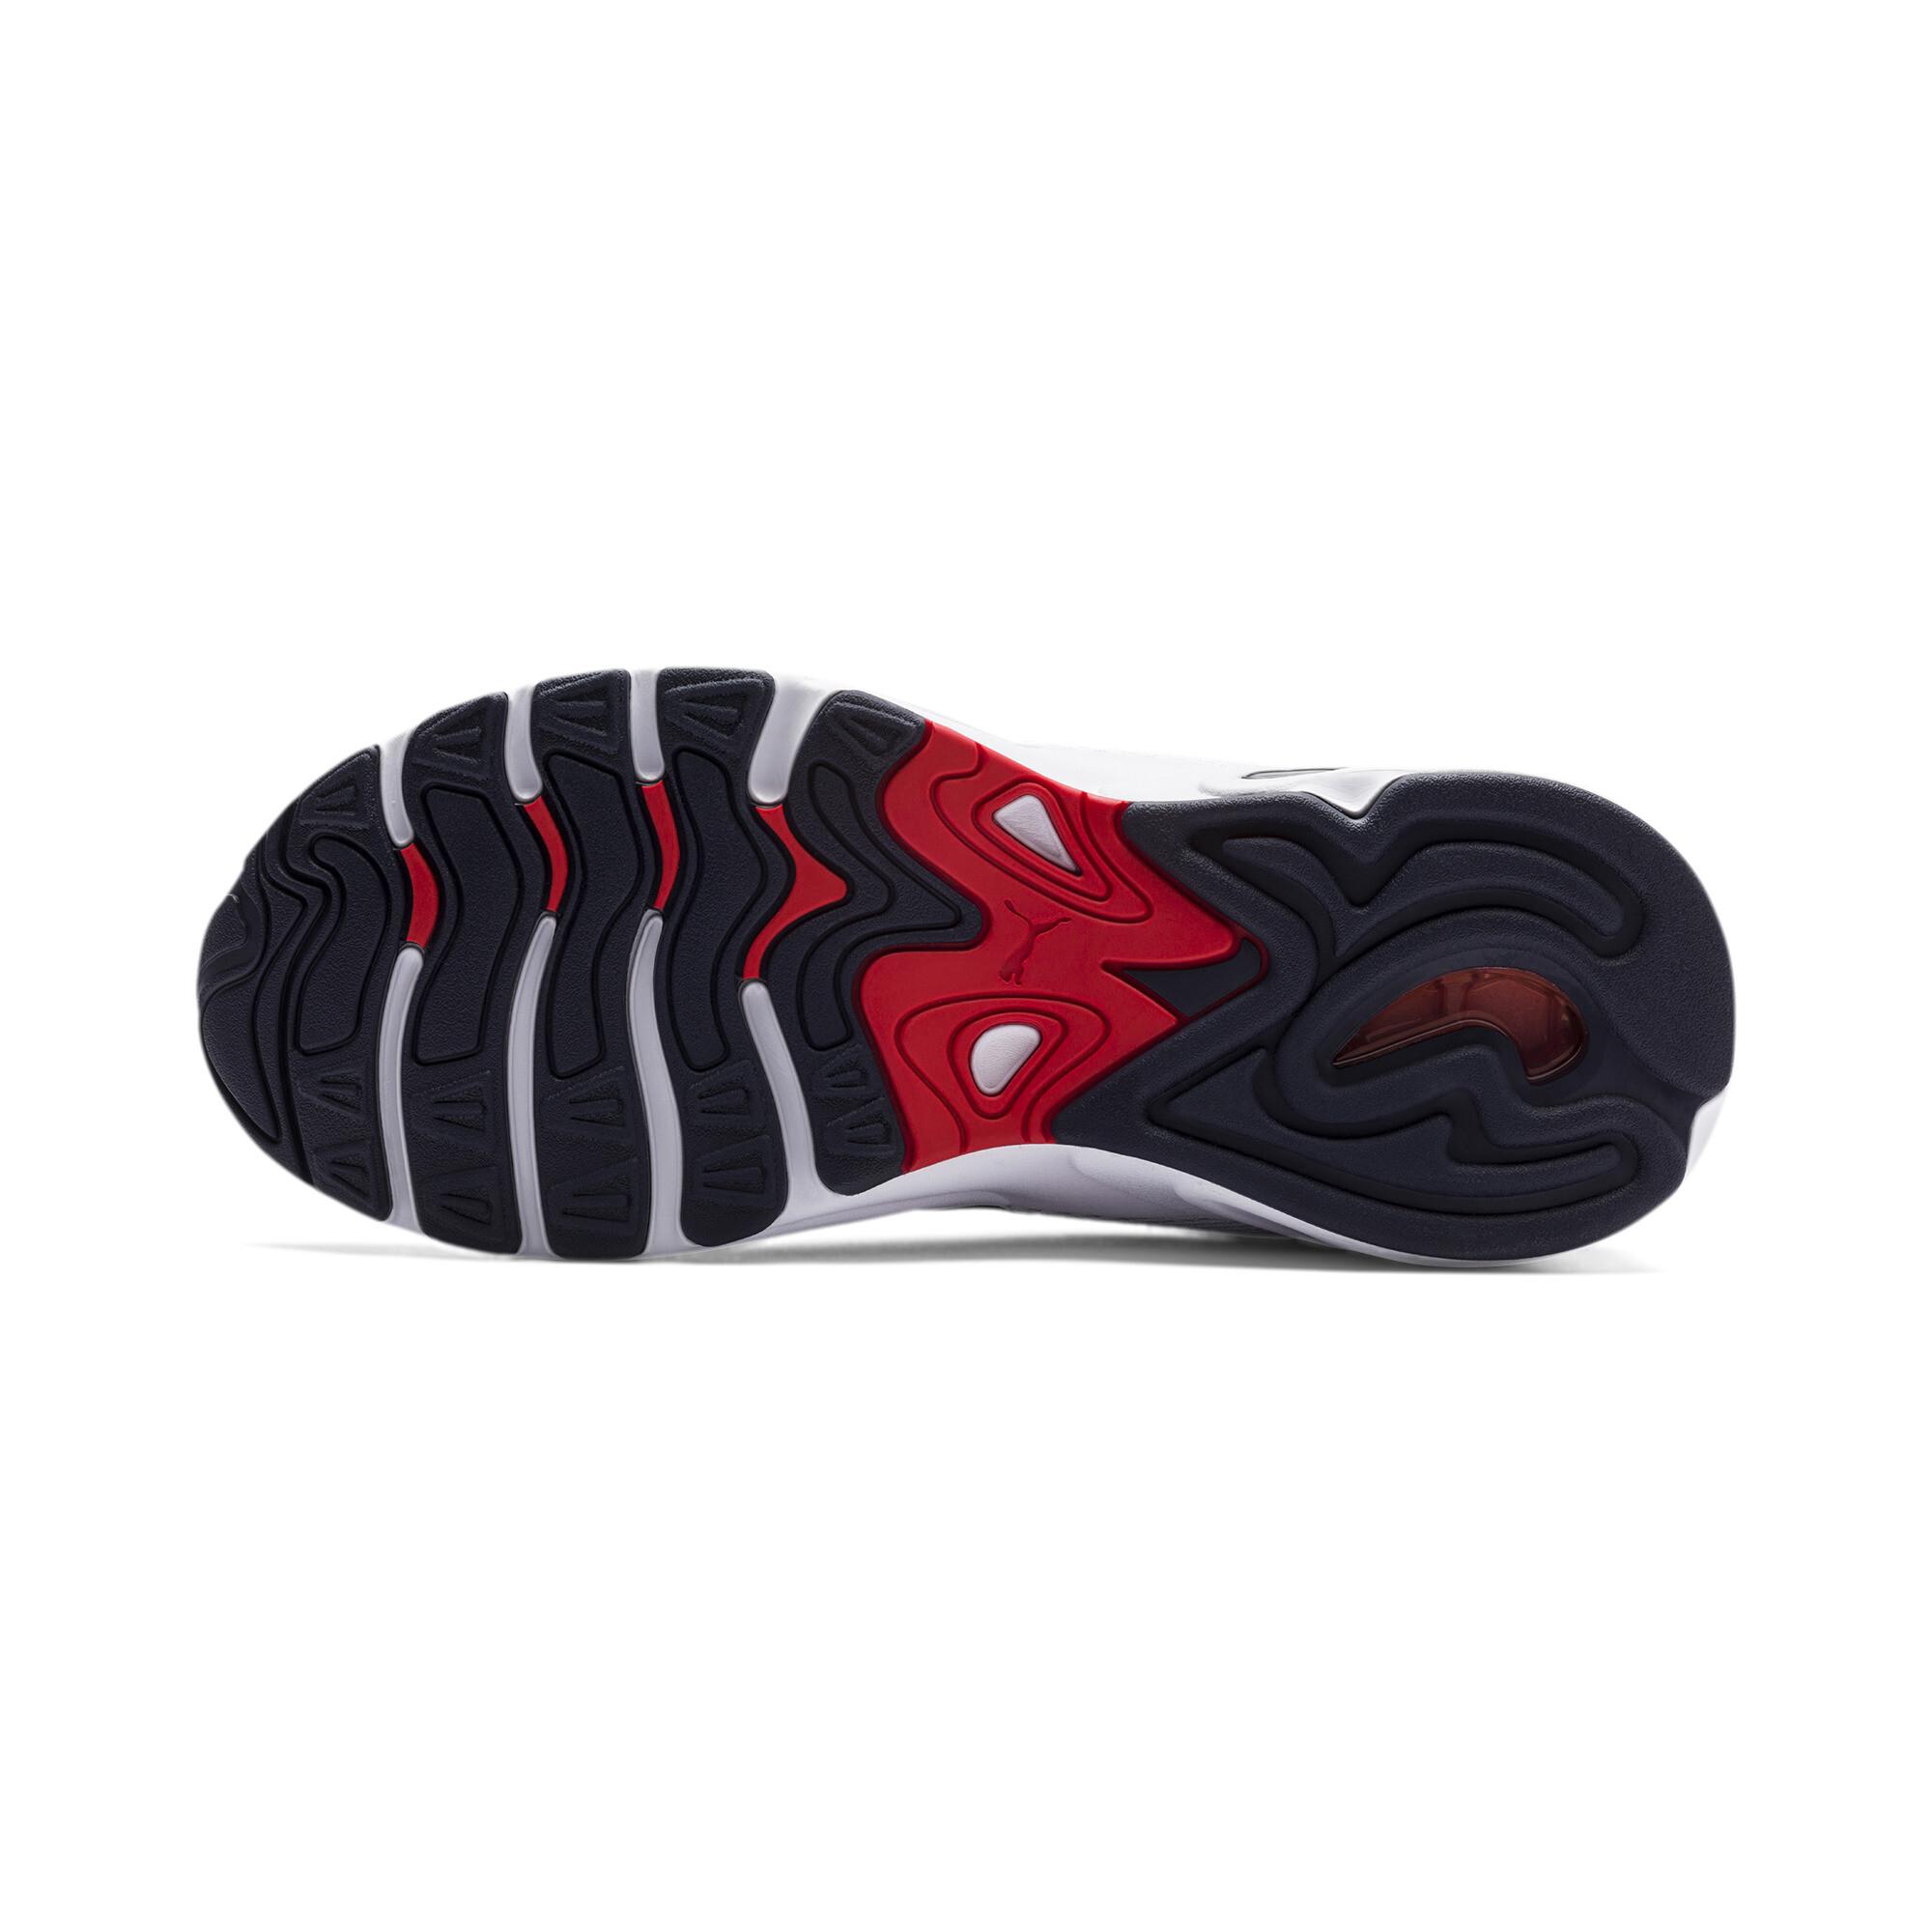 Indexbild 11 - PUMA CELL Viper Leather Sneaker Unisex Schuhe Sport Classics Neu